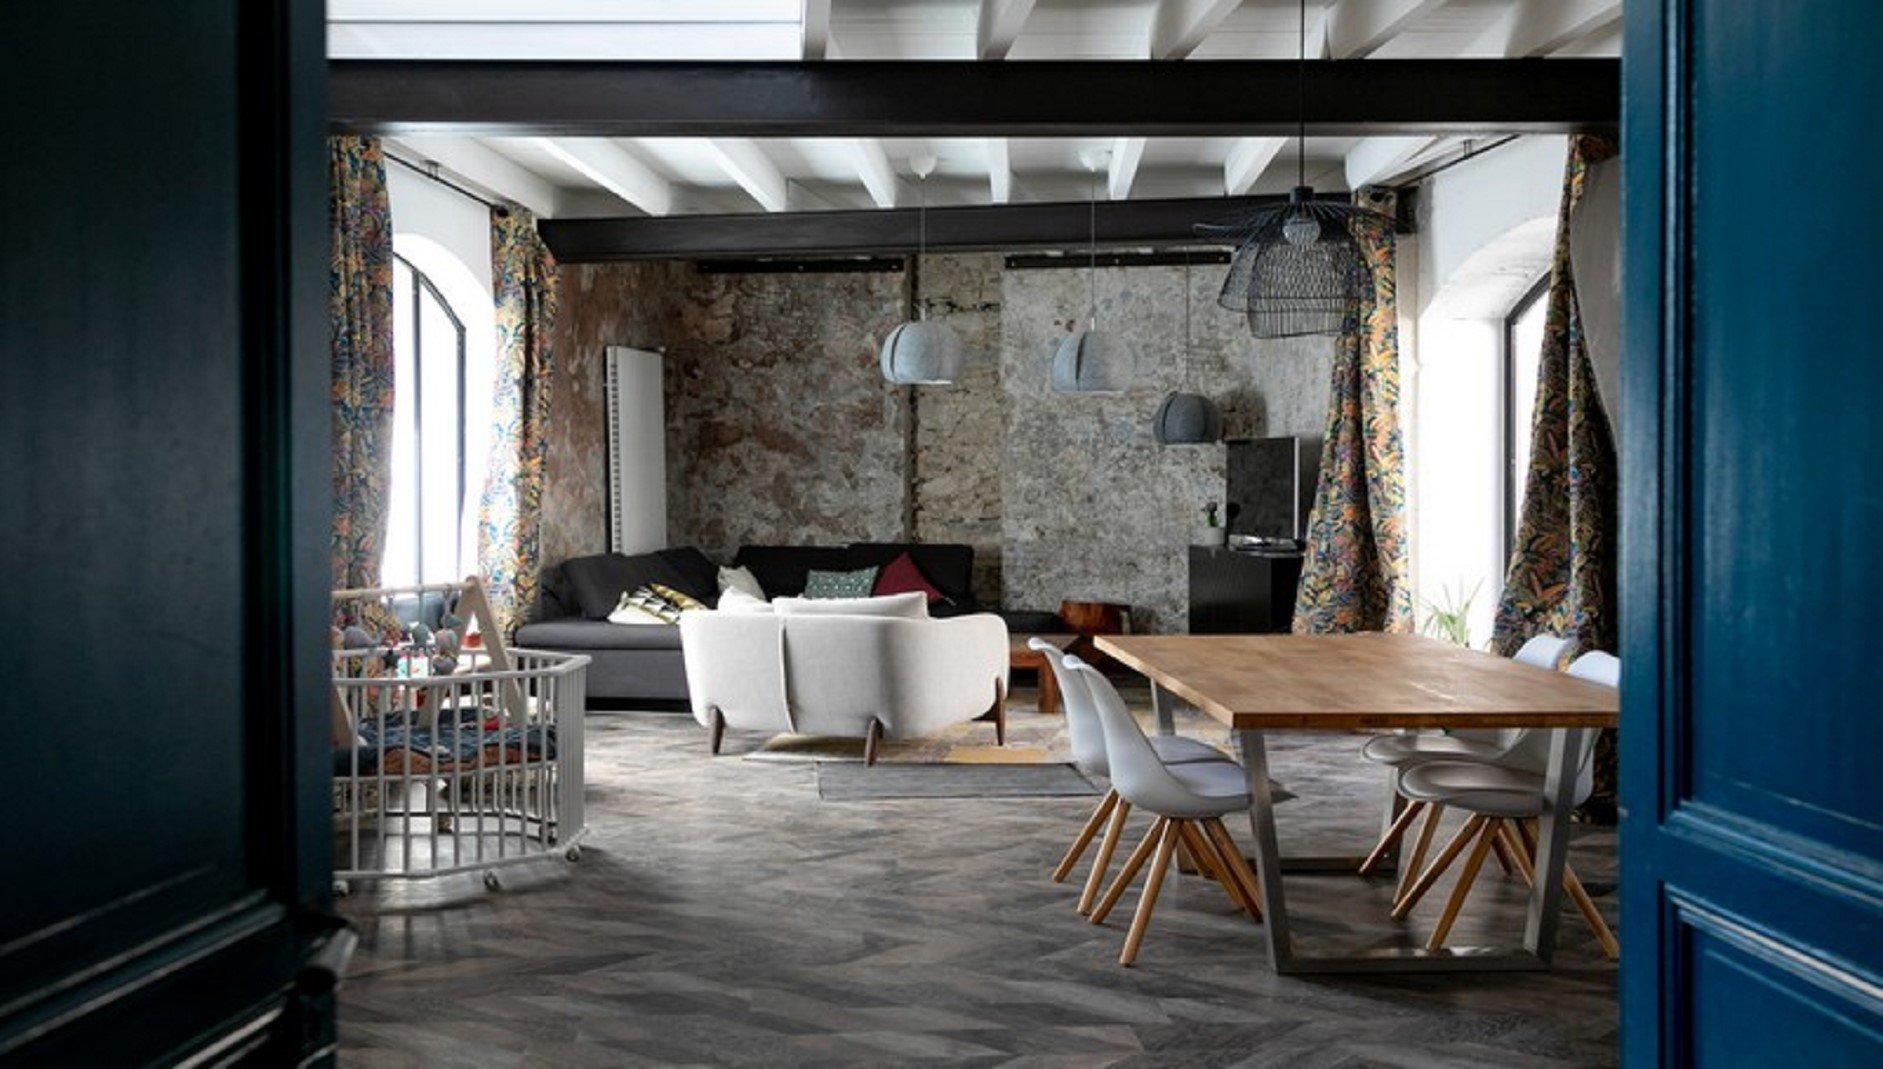 Sublime renovated Maison de maître with courtyard